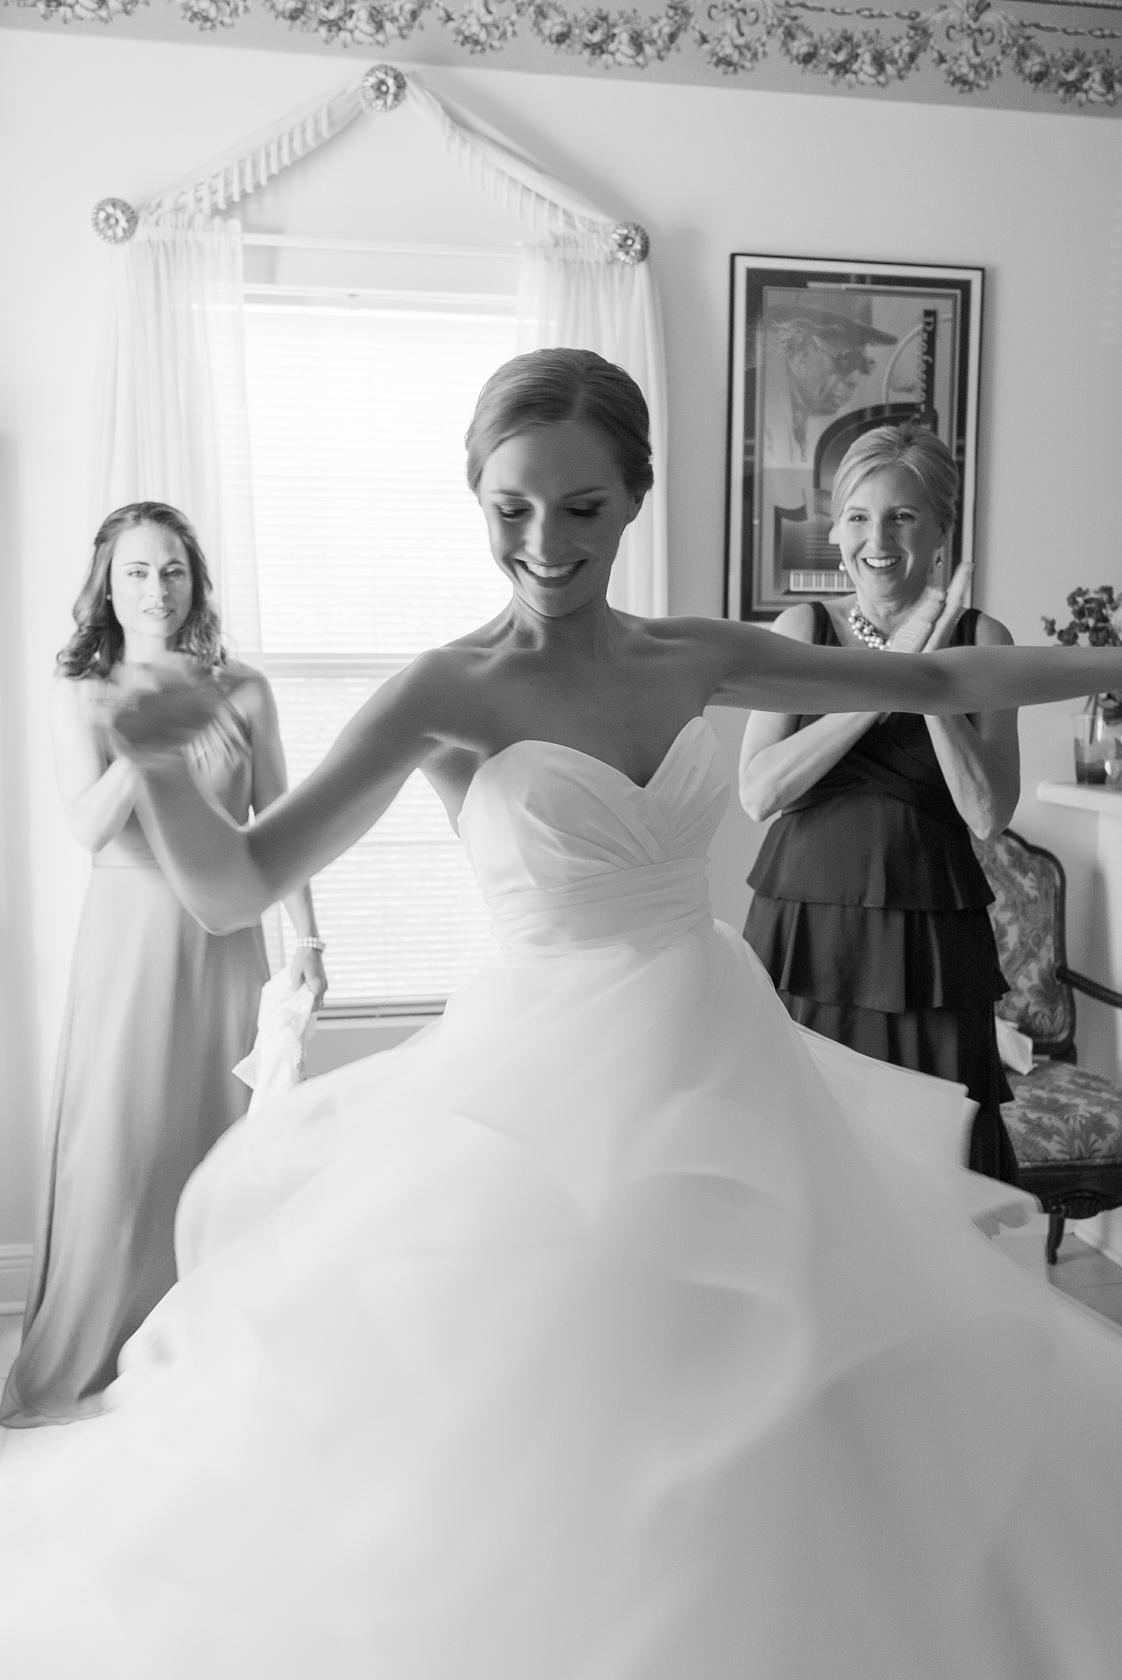 bride spinning in wedding dress